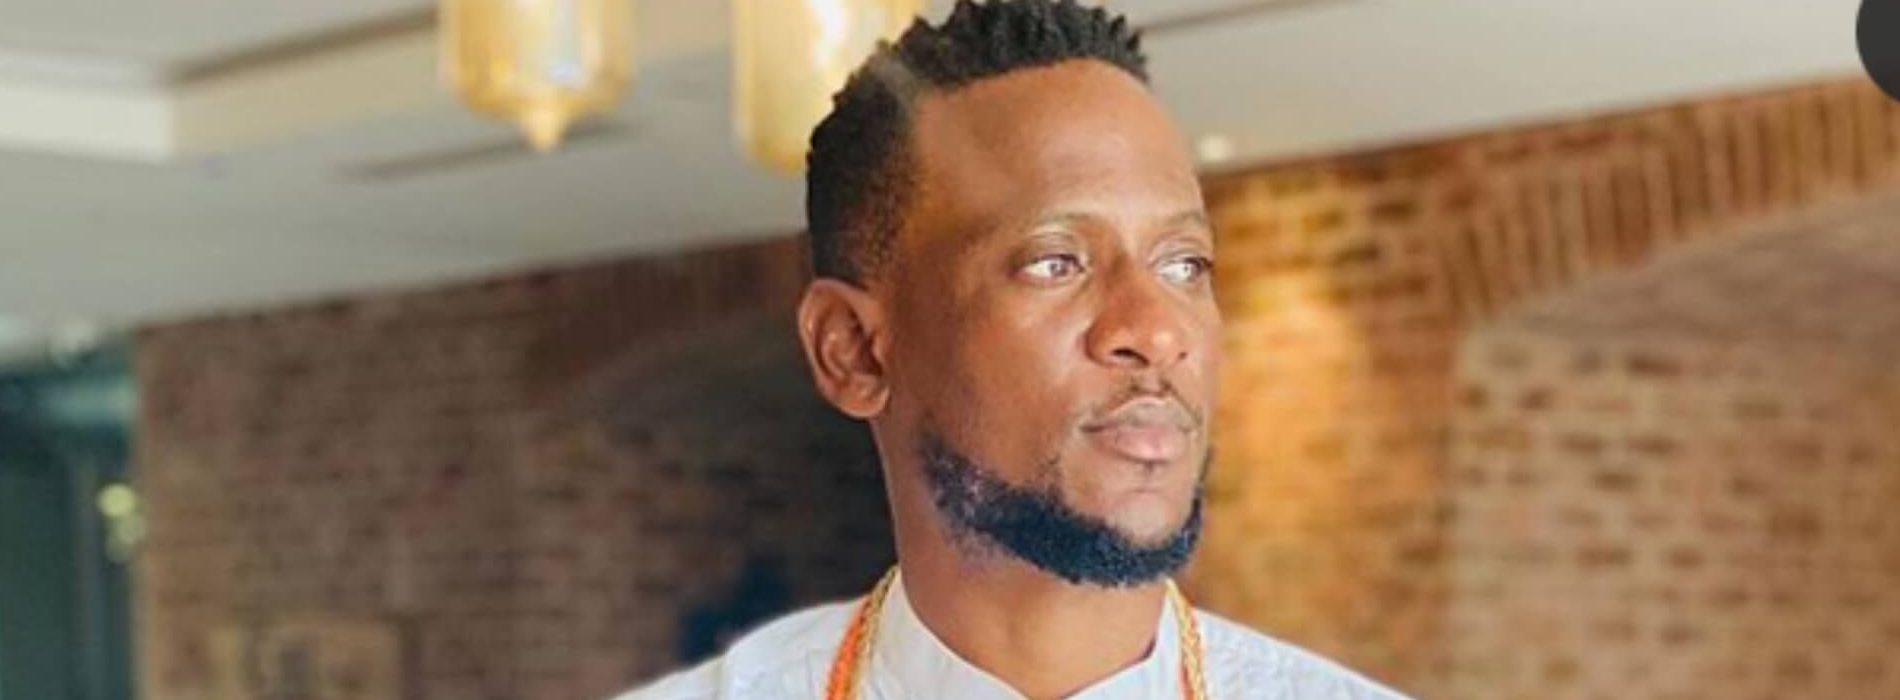 BBNaija Ex Housemate Omashola Oburoh Hints At Being Depressed